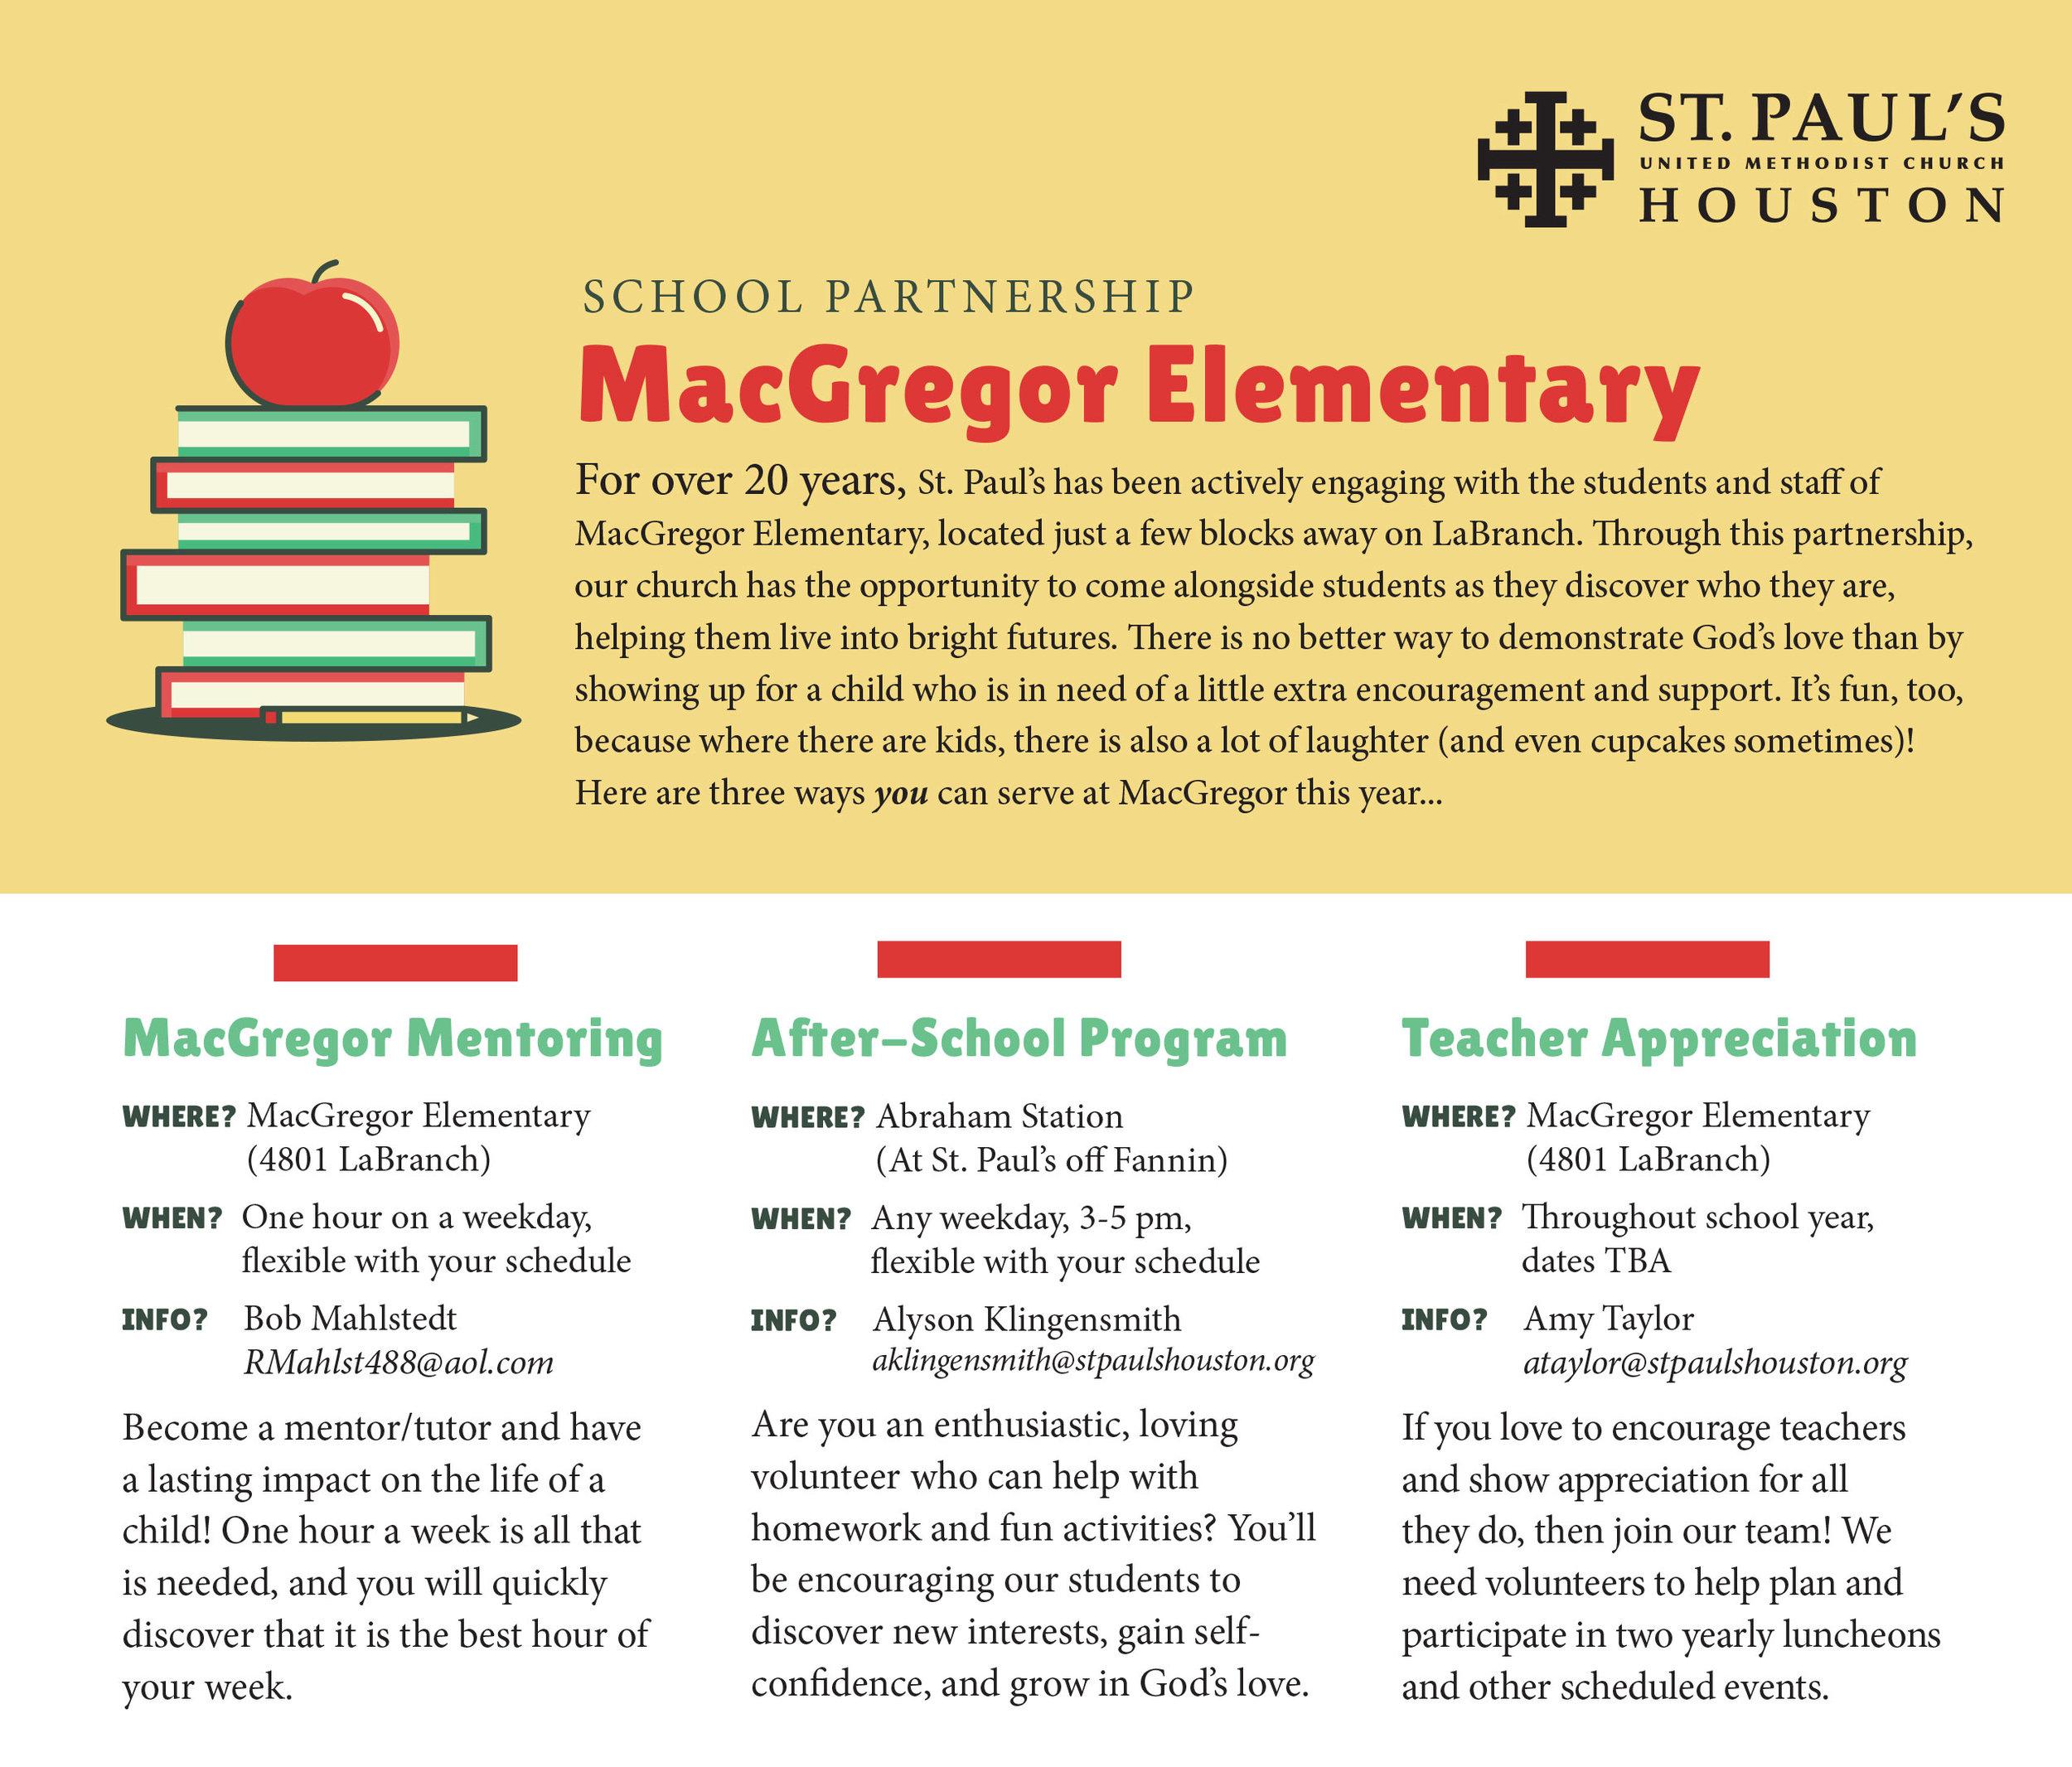 web-macgregor-partnership.jpg